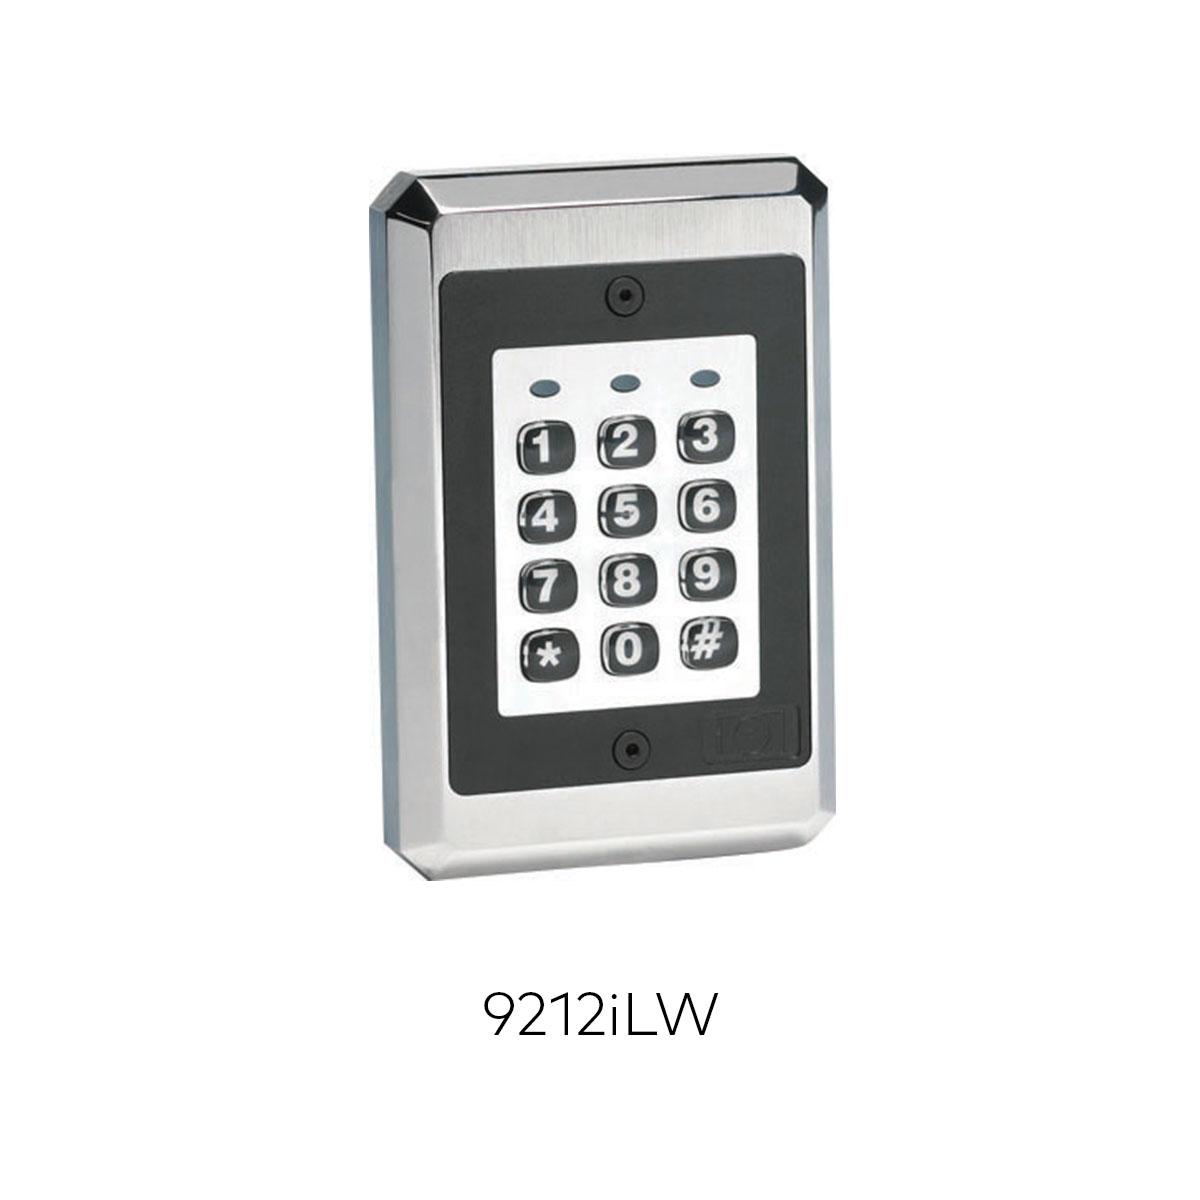 hight resolution of 9212ilw illuminated keypad readers rci ead